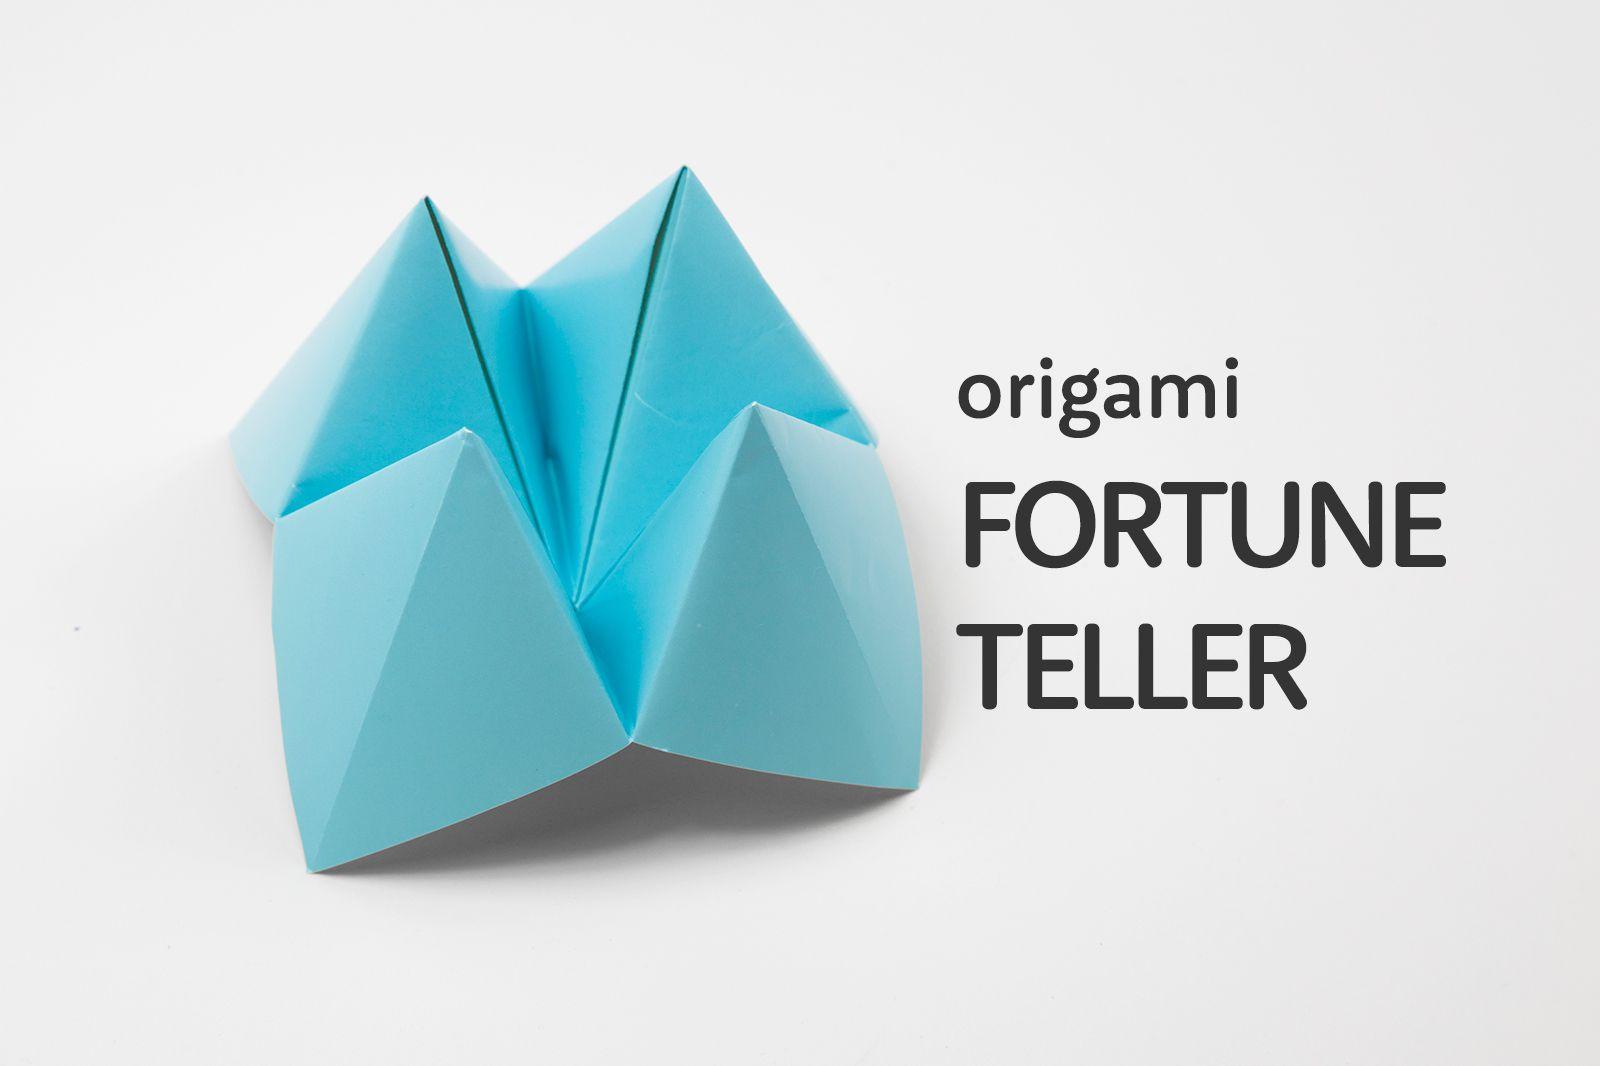 Origami cootie catcher